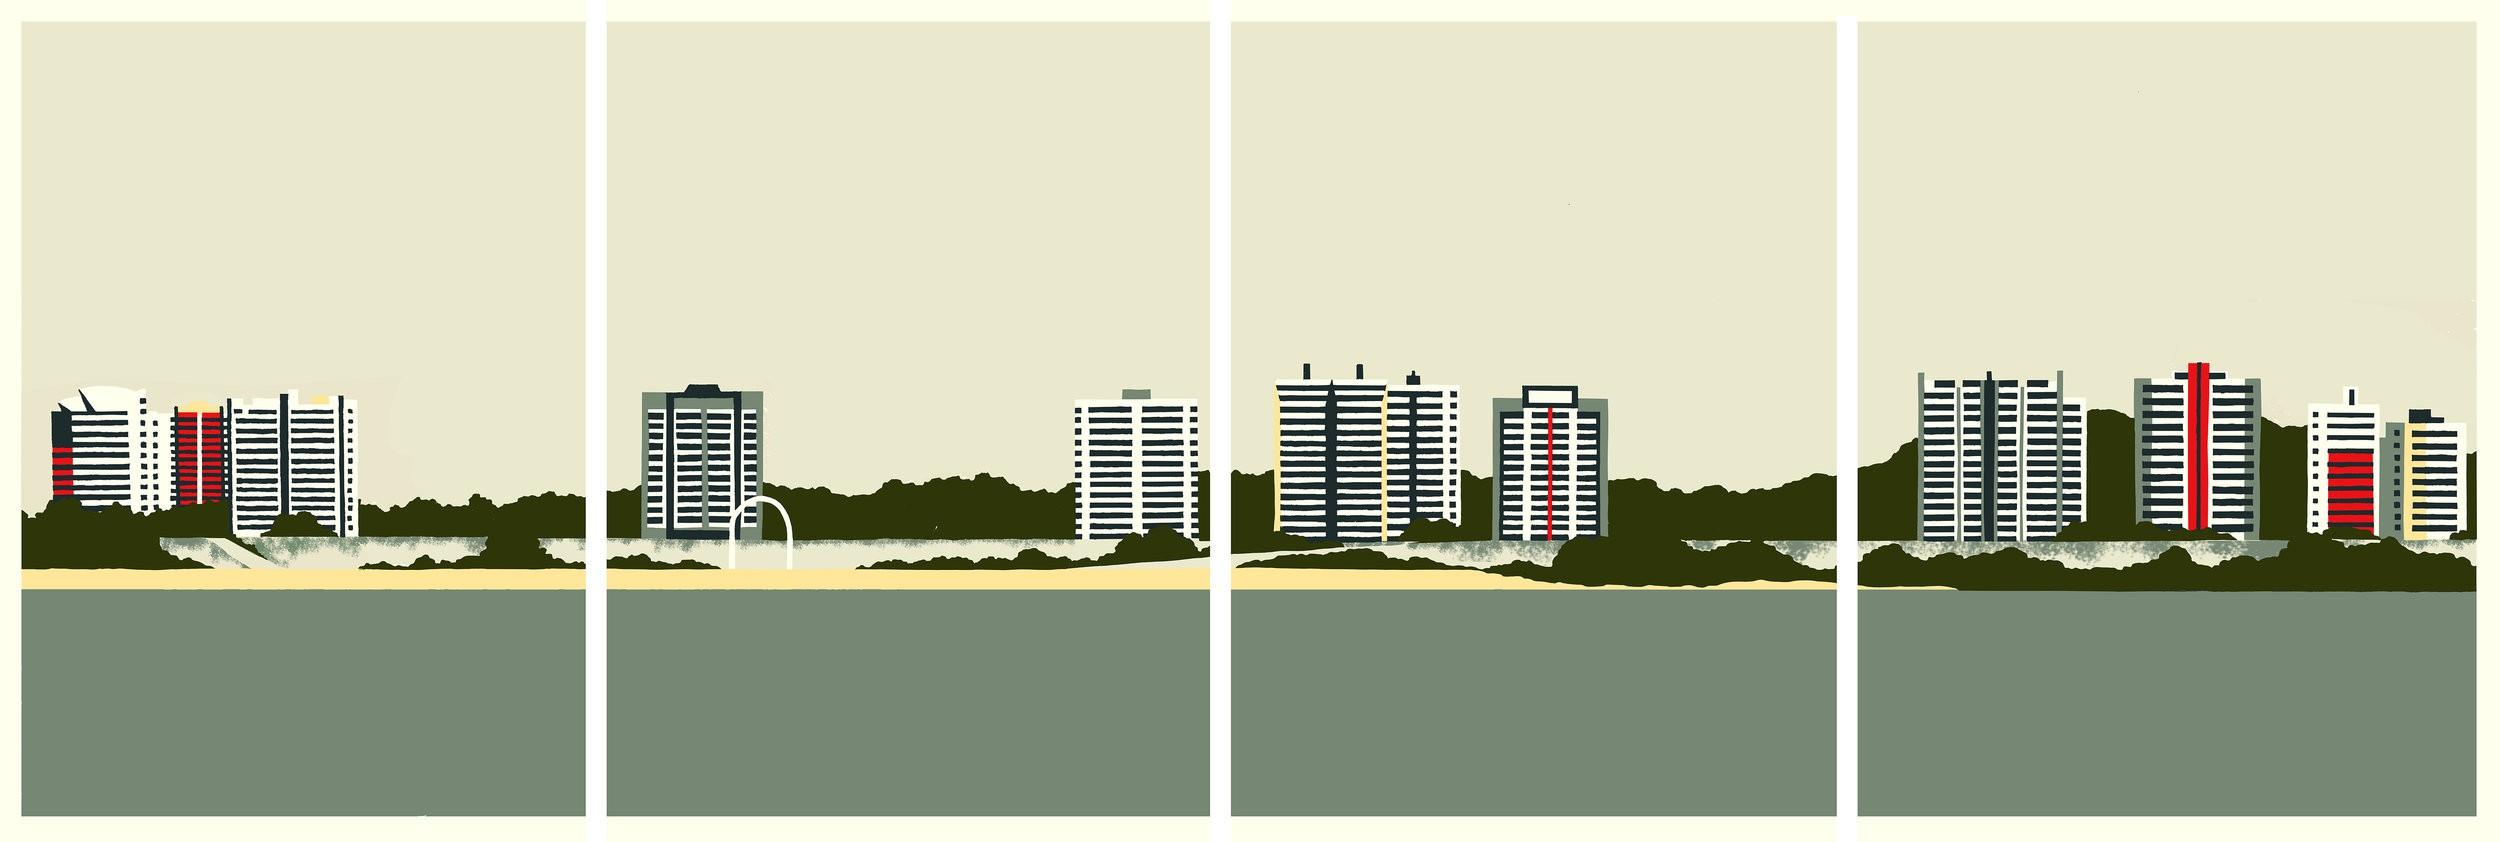 Eliza Southwood, Manaus Amazon River, 2019, £750, limited edition print, edition of 5, Wychwood Art